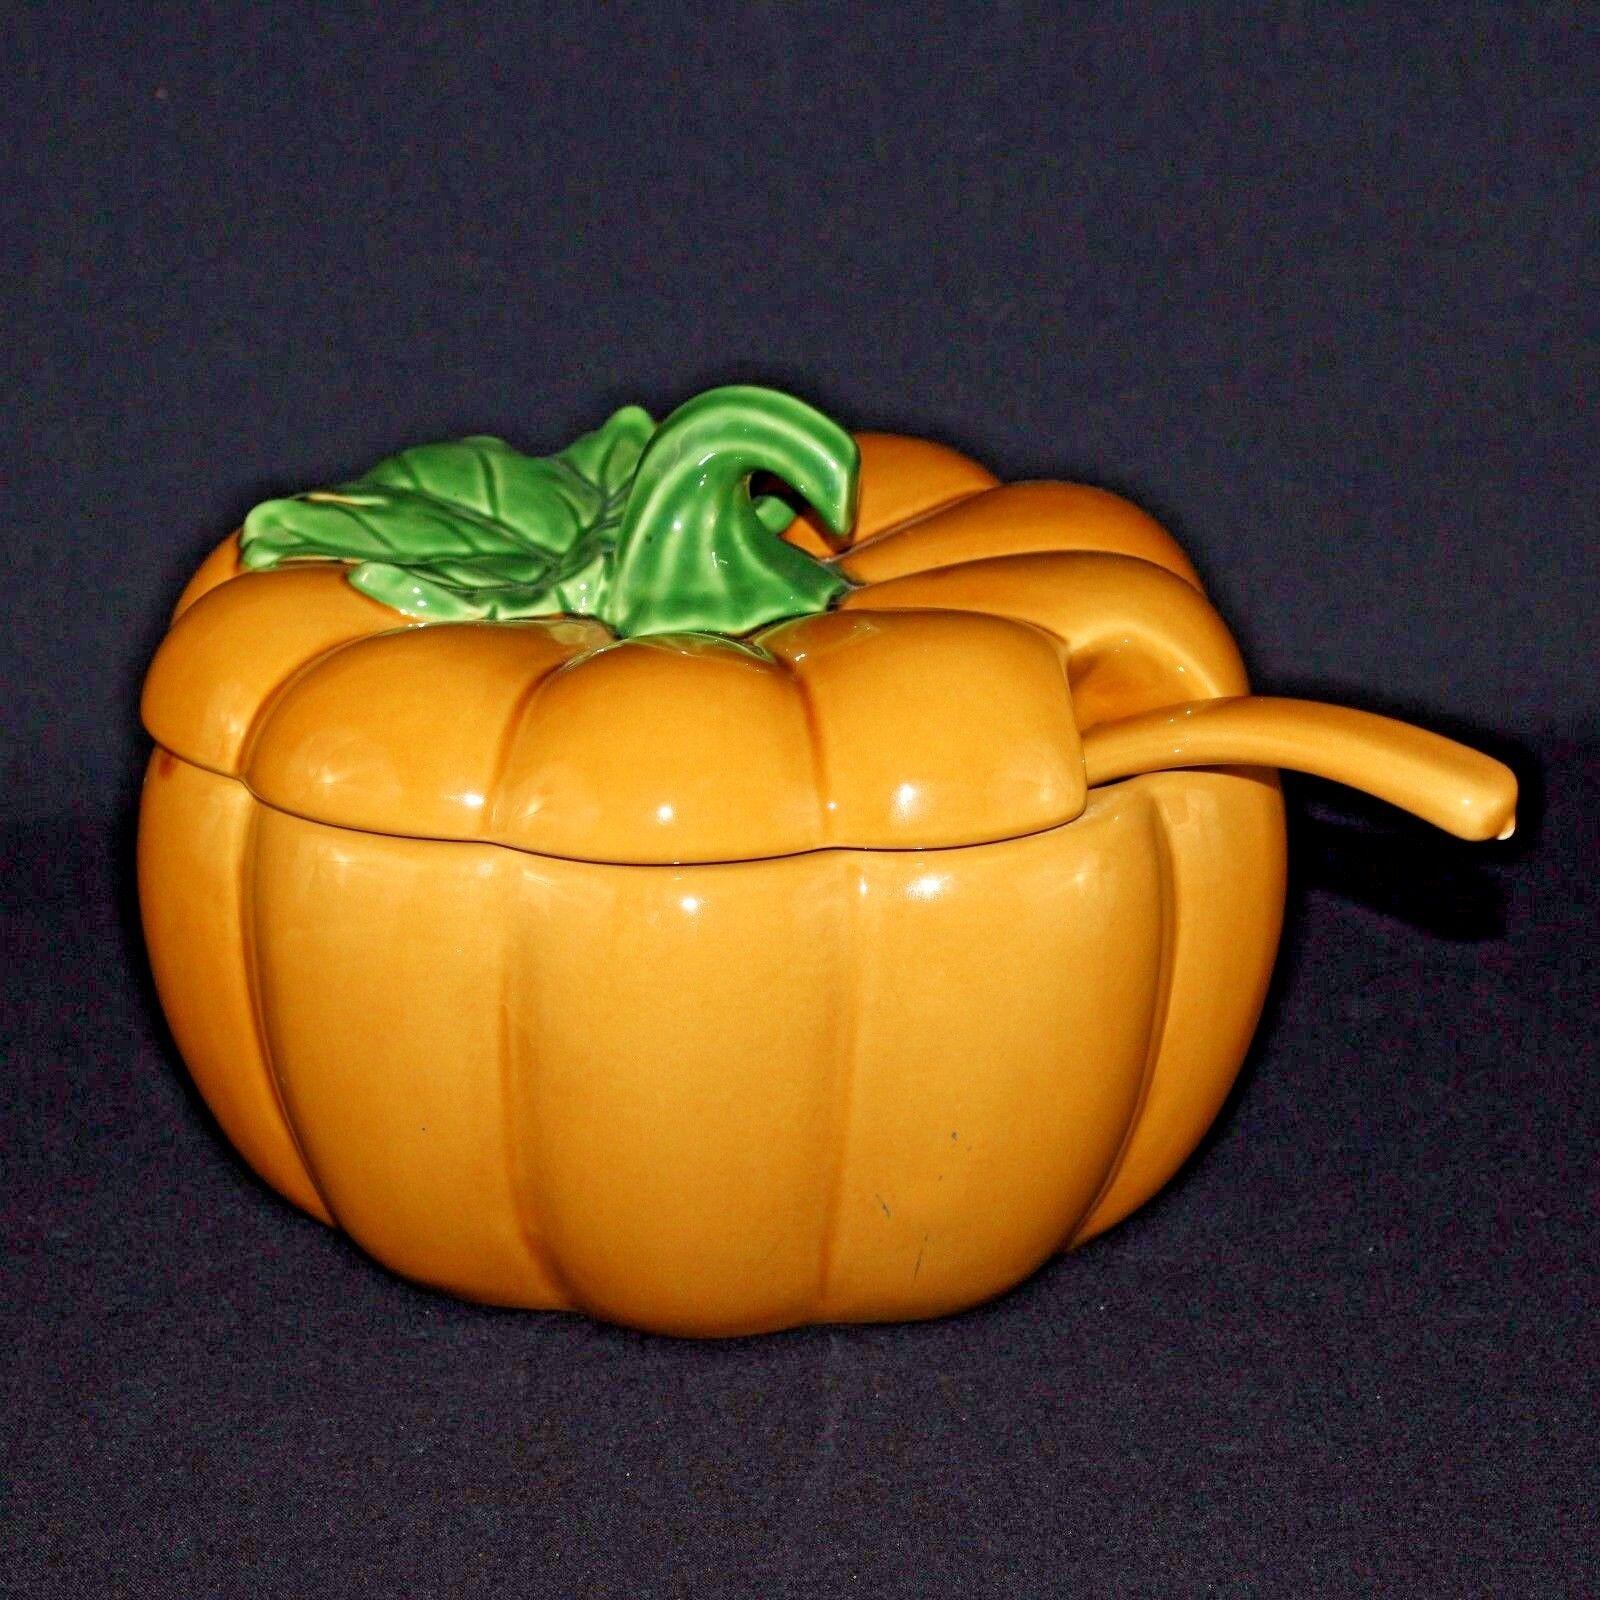 Pier 1 Harvest or Thanksgiving Fall Orange Pumpkin Soup Tureen Ladle 3PC Set